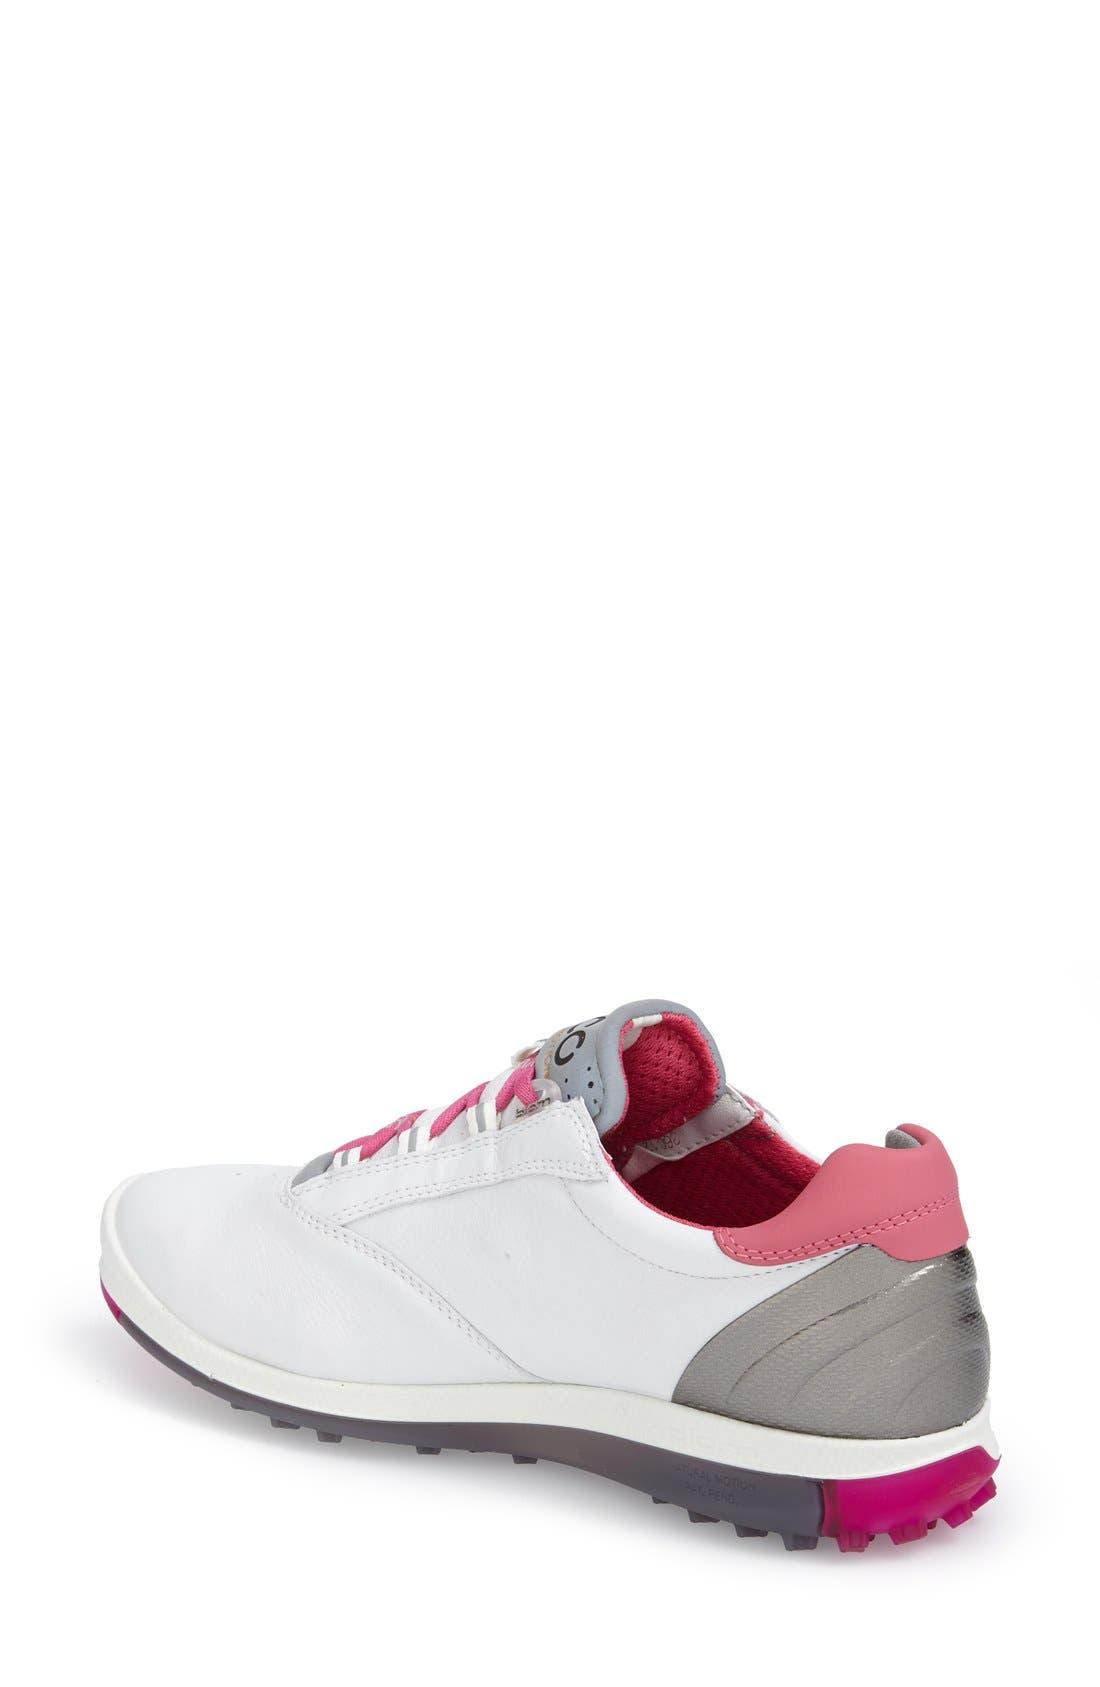 'BIOM' Hydromax<sup>®</sup> Waterproof Golf Shoe,                             Alternate thumbnail 21, color,